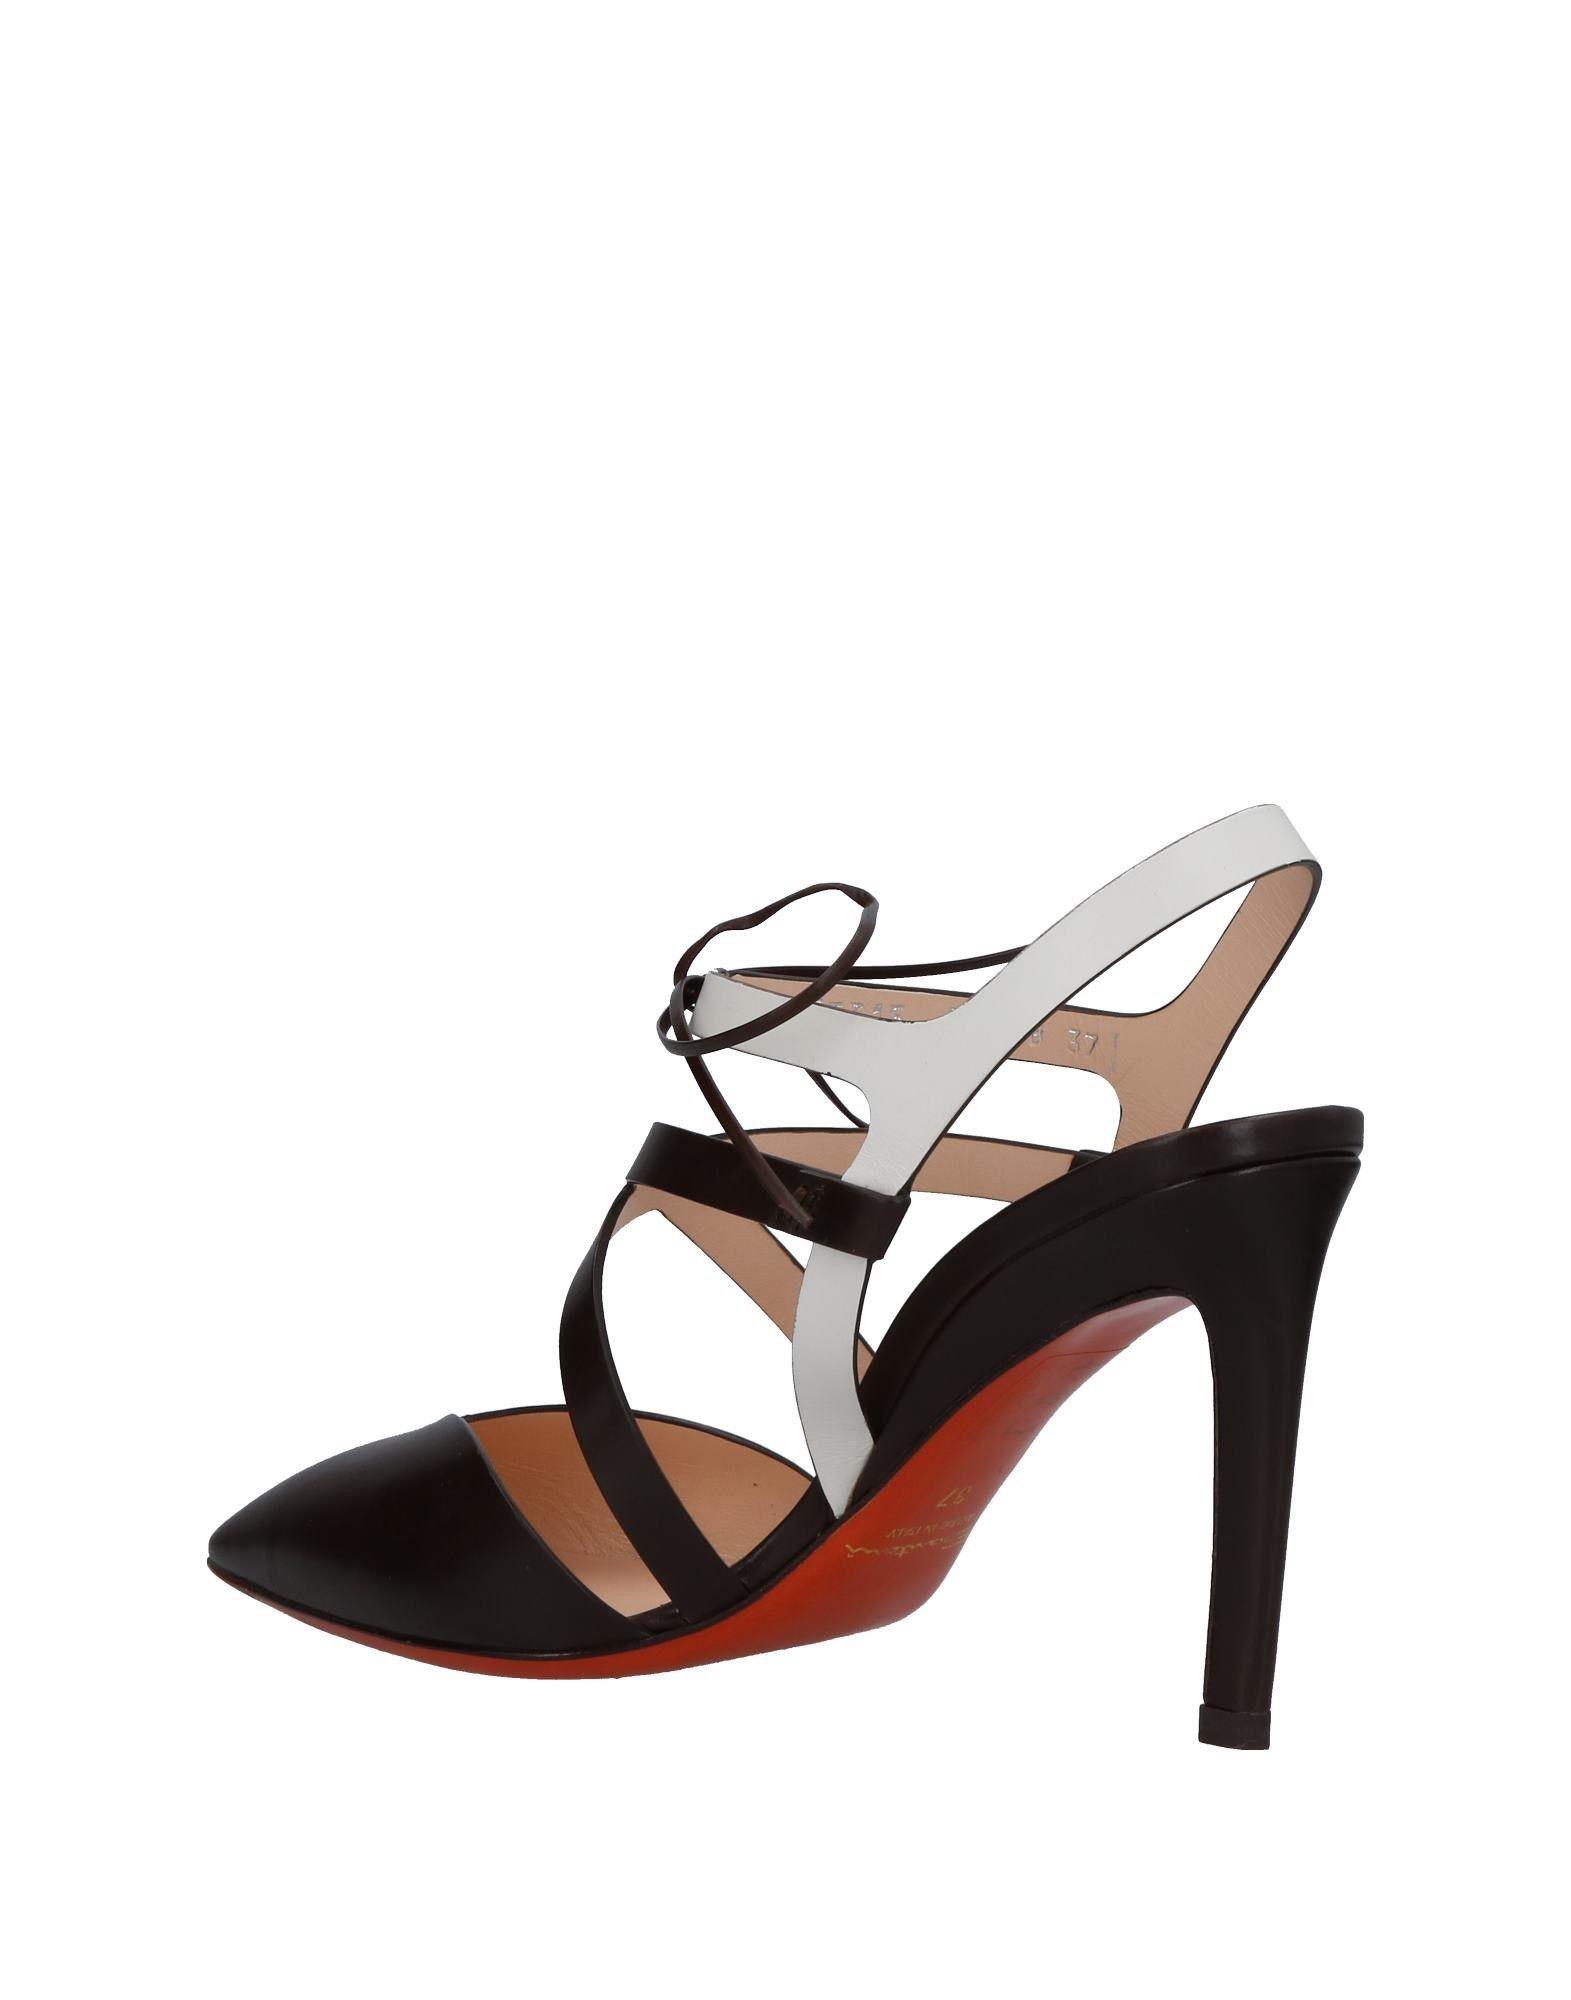 Santoni Pumps Damen Schuhe  11390465LHGut aussehende strapazierfähige Schuhe Damen 952ede